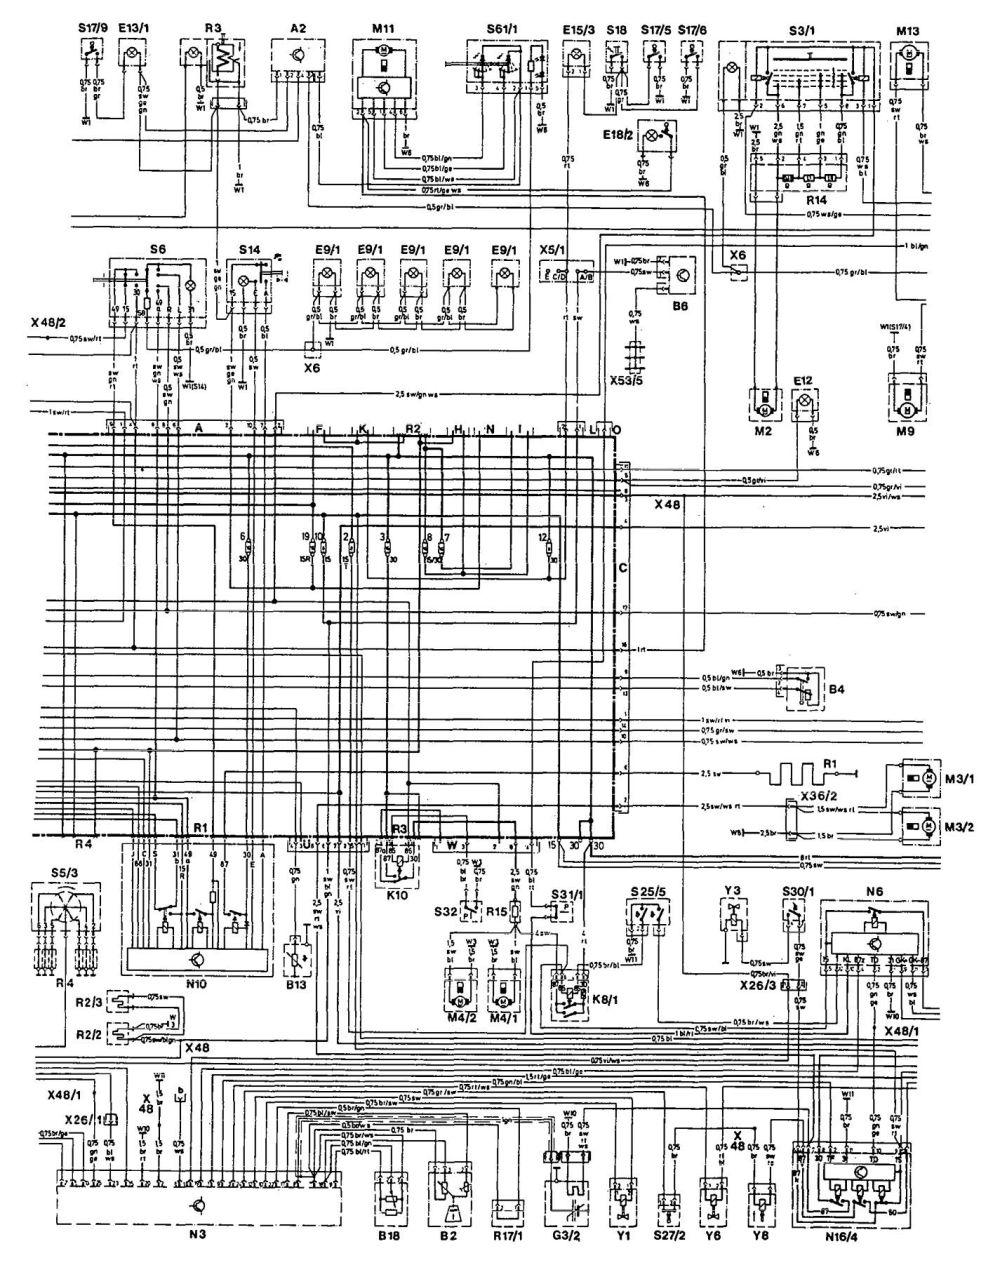 medium resolution of  dodge caravan wiring diagram on 93 geo metro wiring diagram 93 dodge daytona wiring diagram